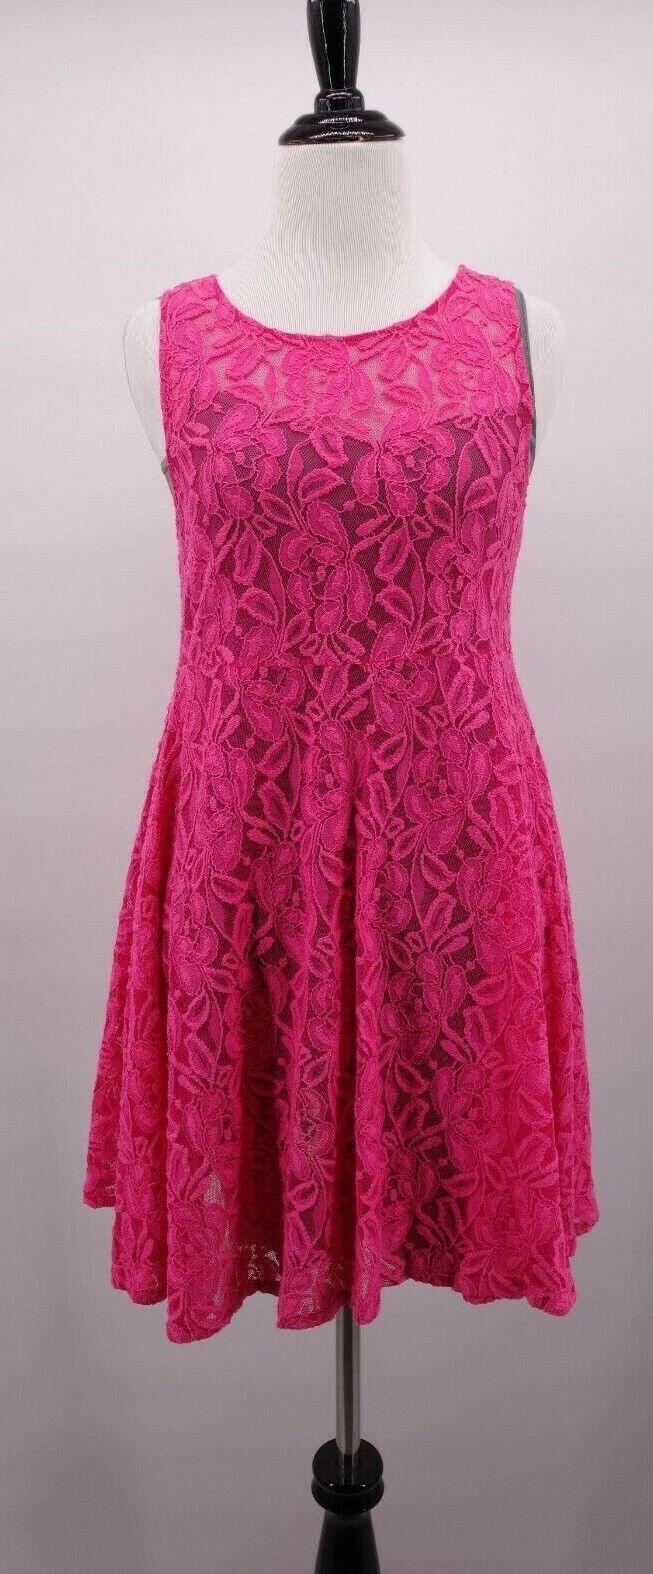 Free People XS Romantic Rosa Flower Lace Boho Beach Summer Dress & Seamless Slip